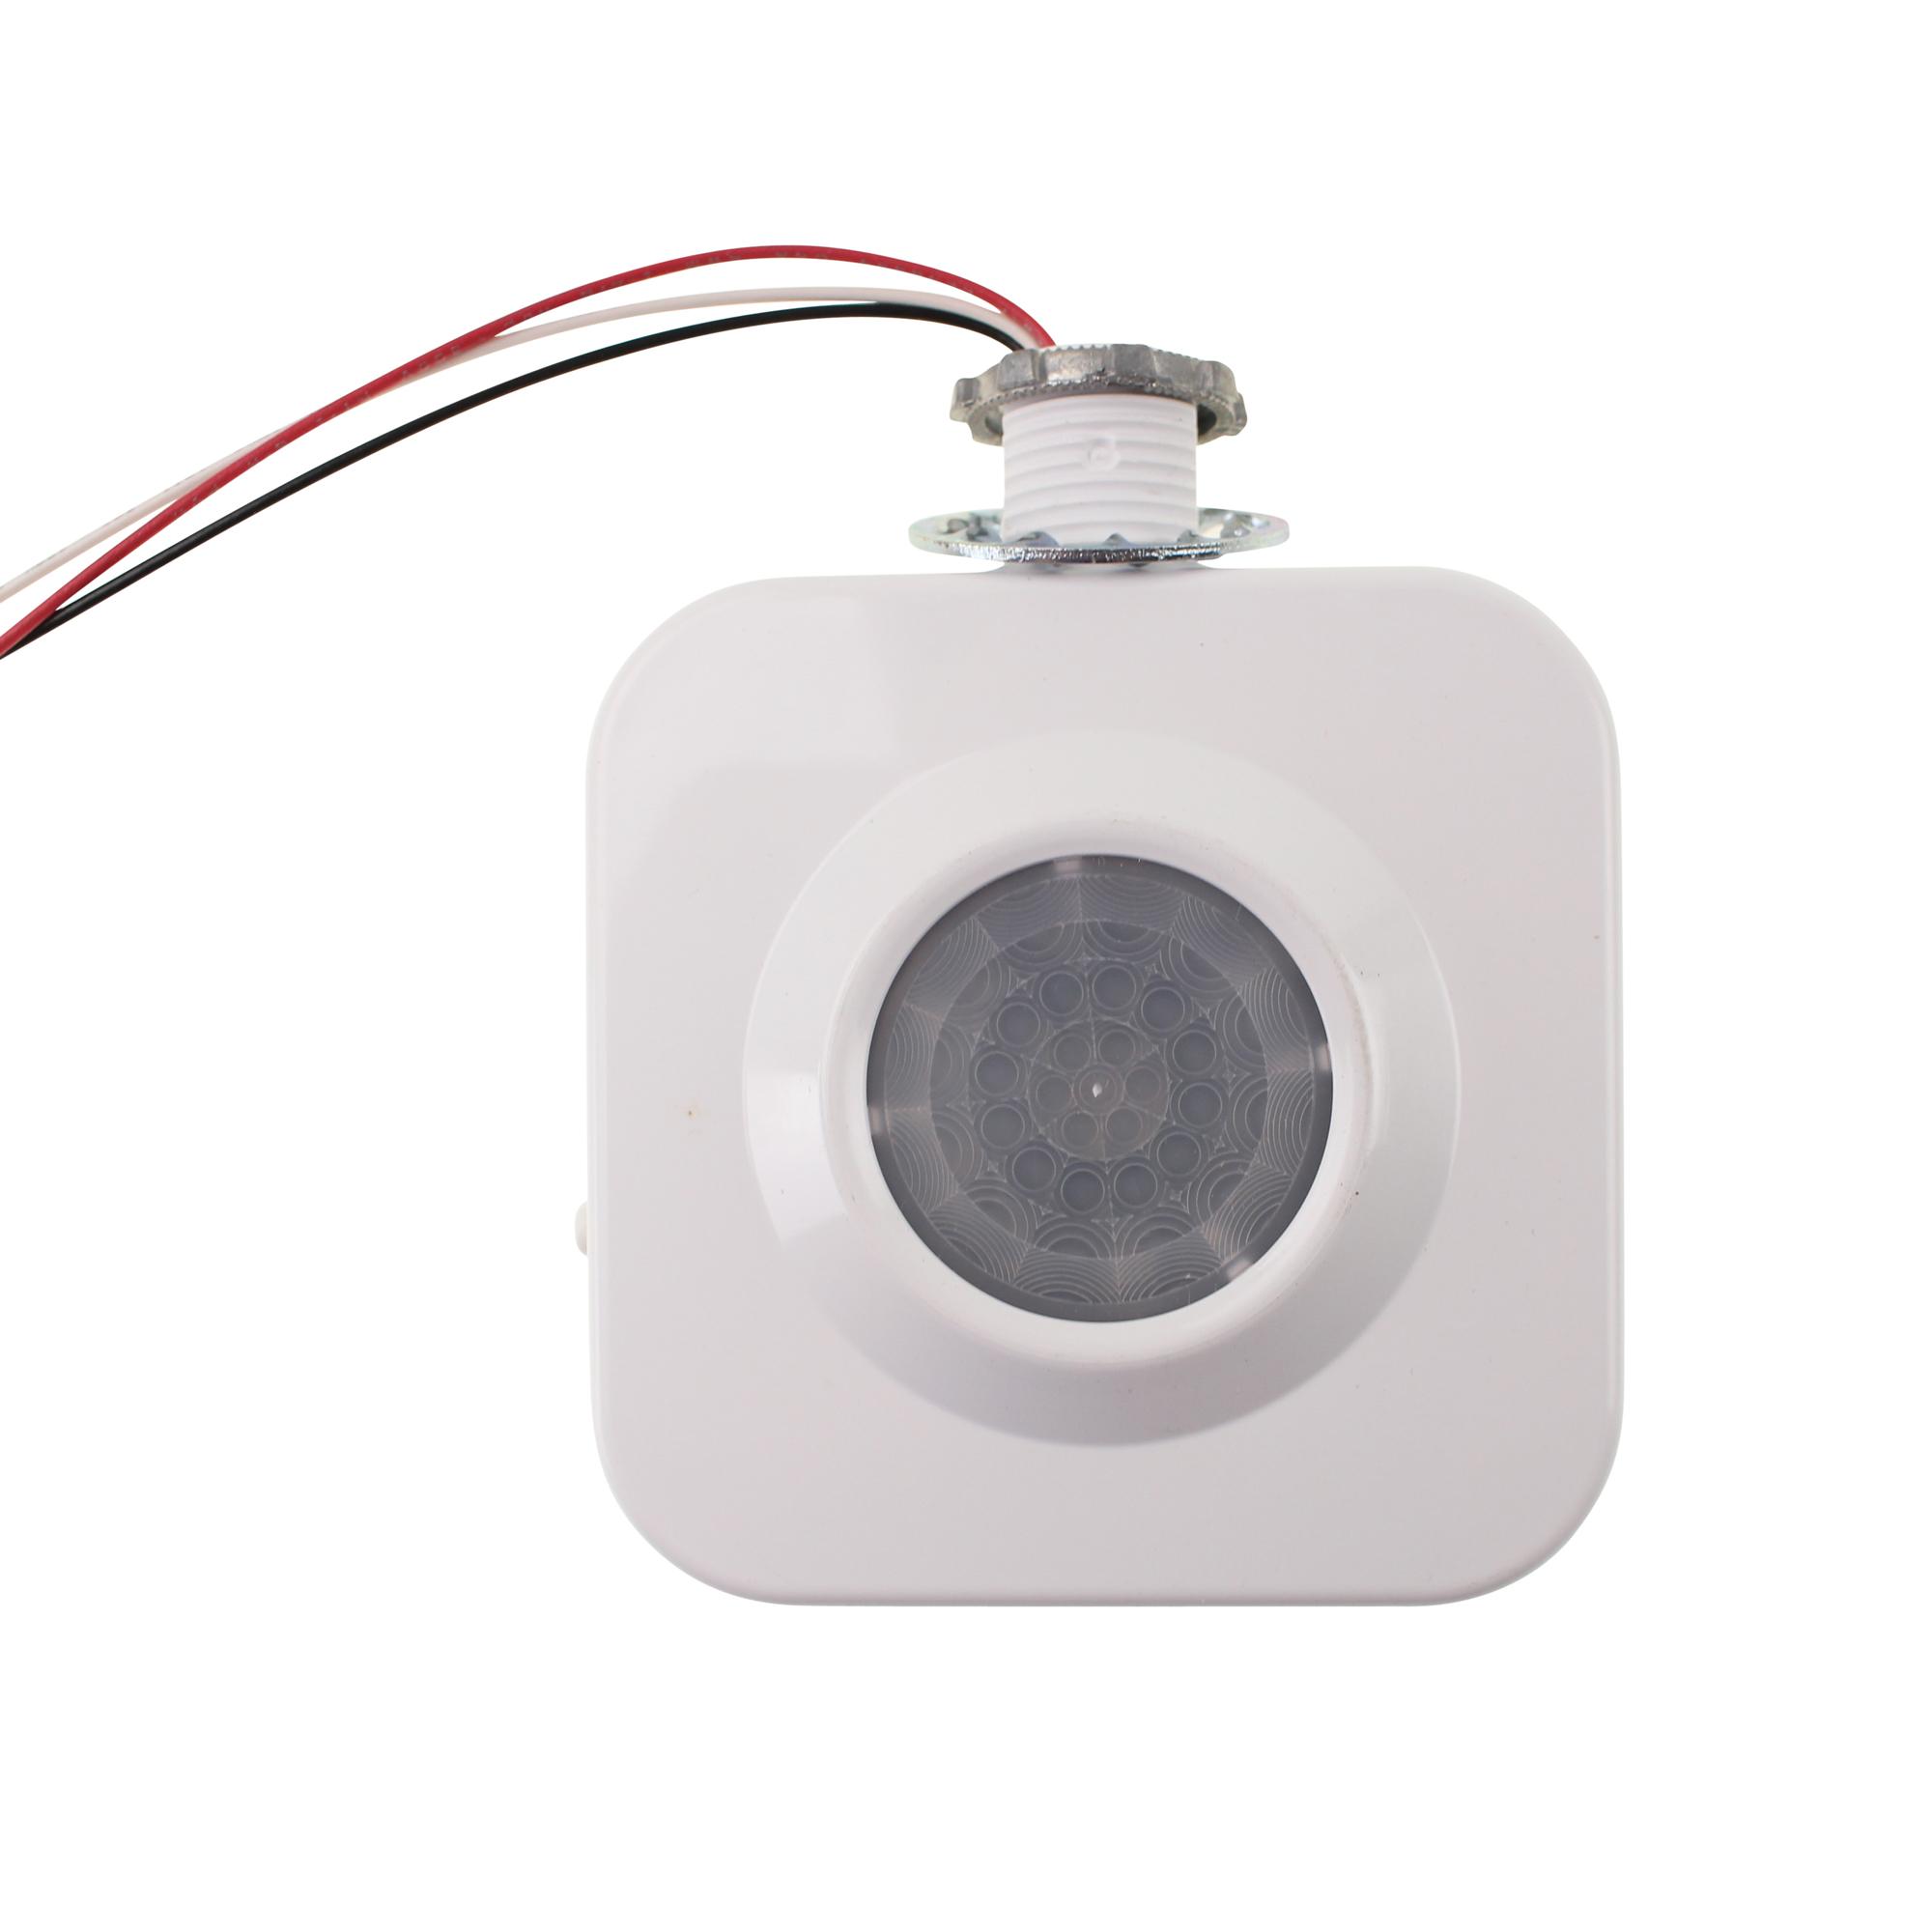 Sensor Switch Cmb 6 High Bay Occupancy Sensor Fixture